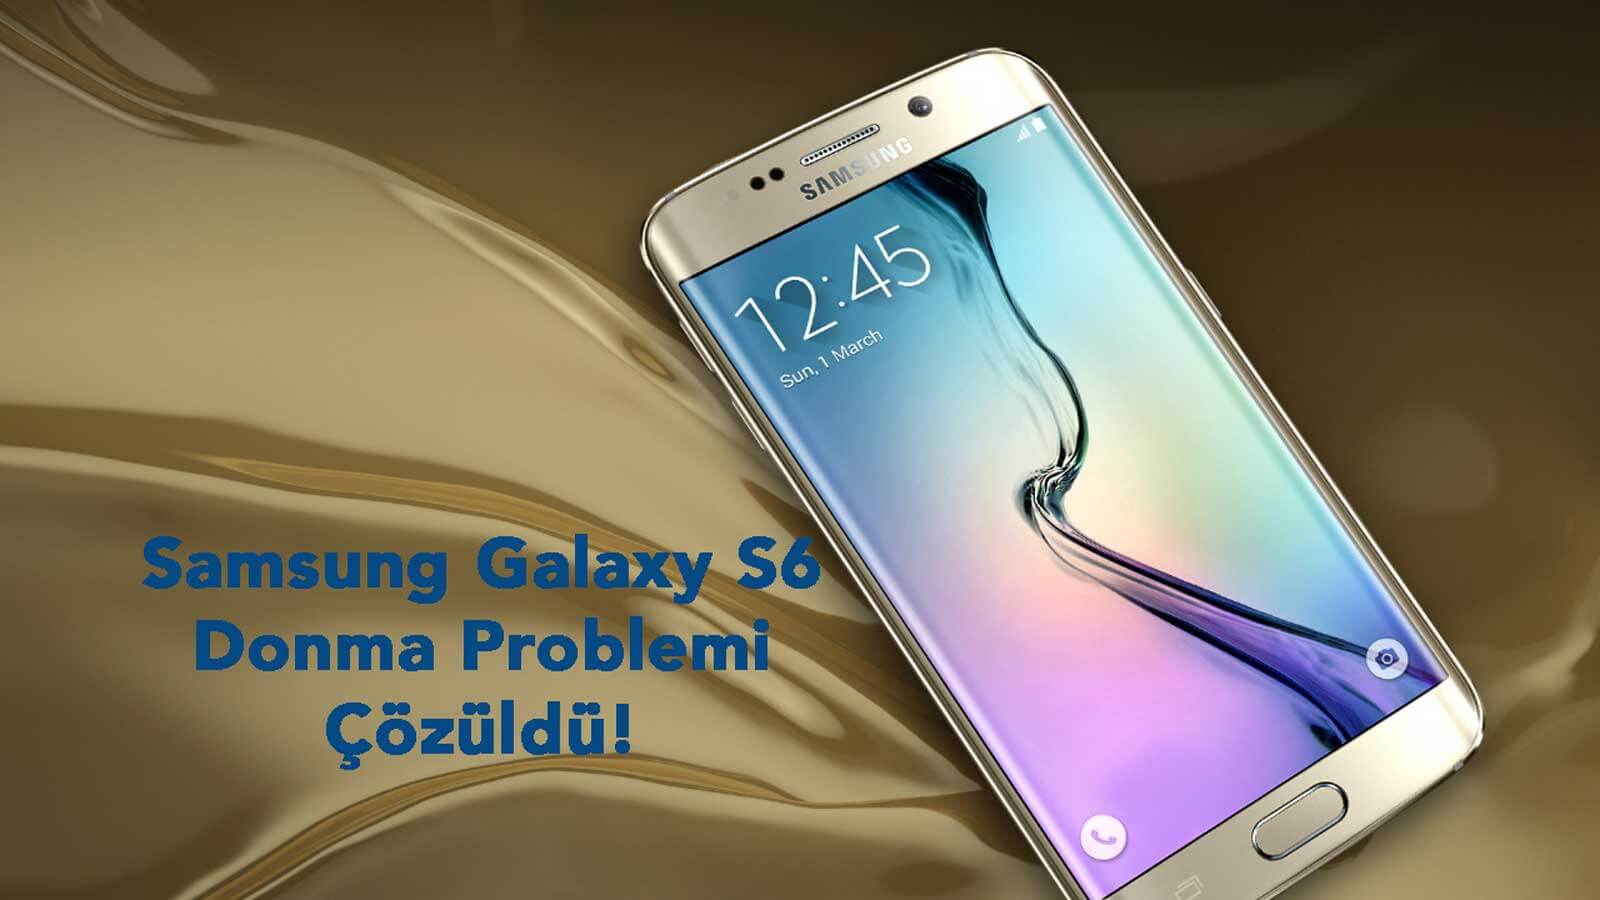 Samsung Galaxy S6 donuyor Galaxy S6 Donma Samsung Galaxy S6 Donma Problemi galaxy s6 donuyor